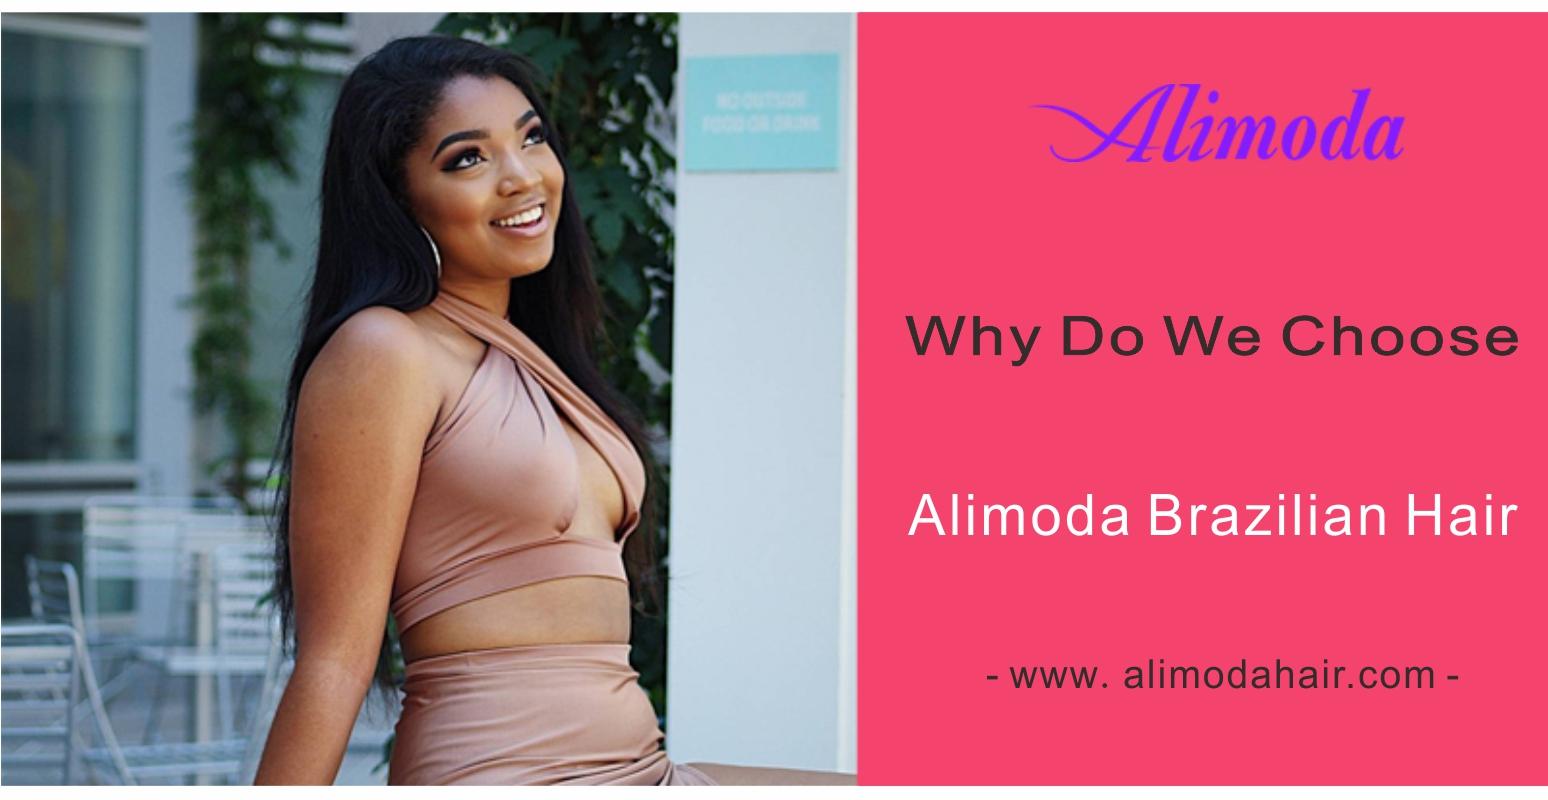 Why do we choose Alimoda Brazilian hair